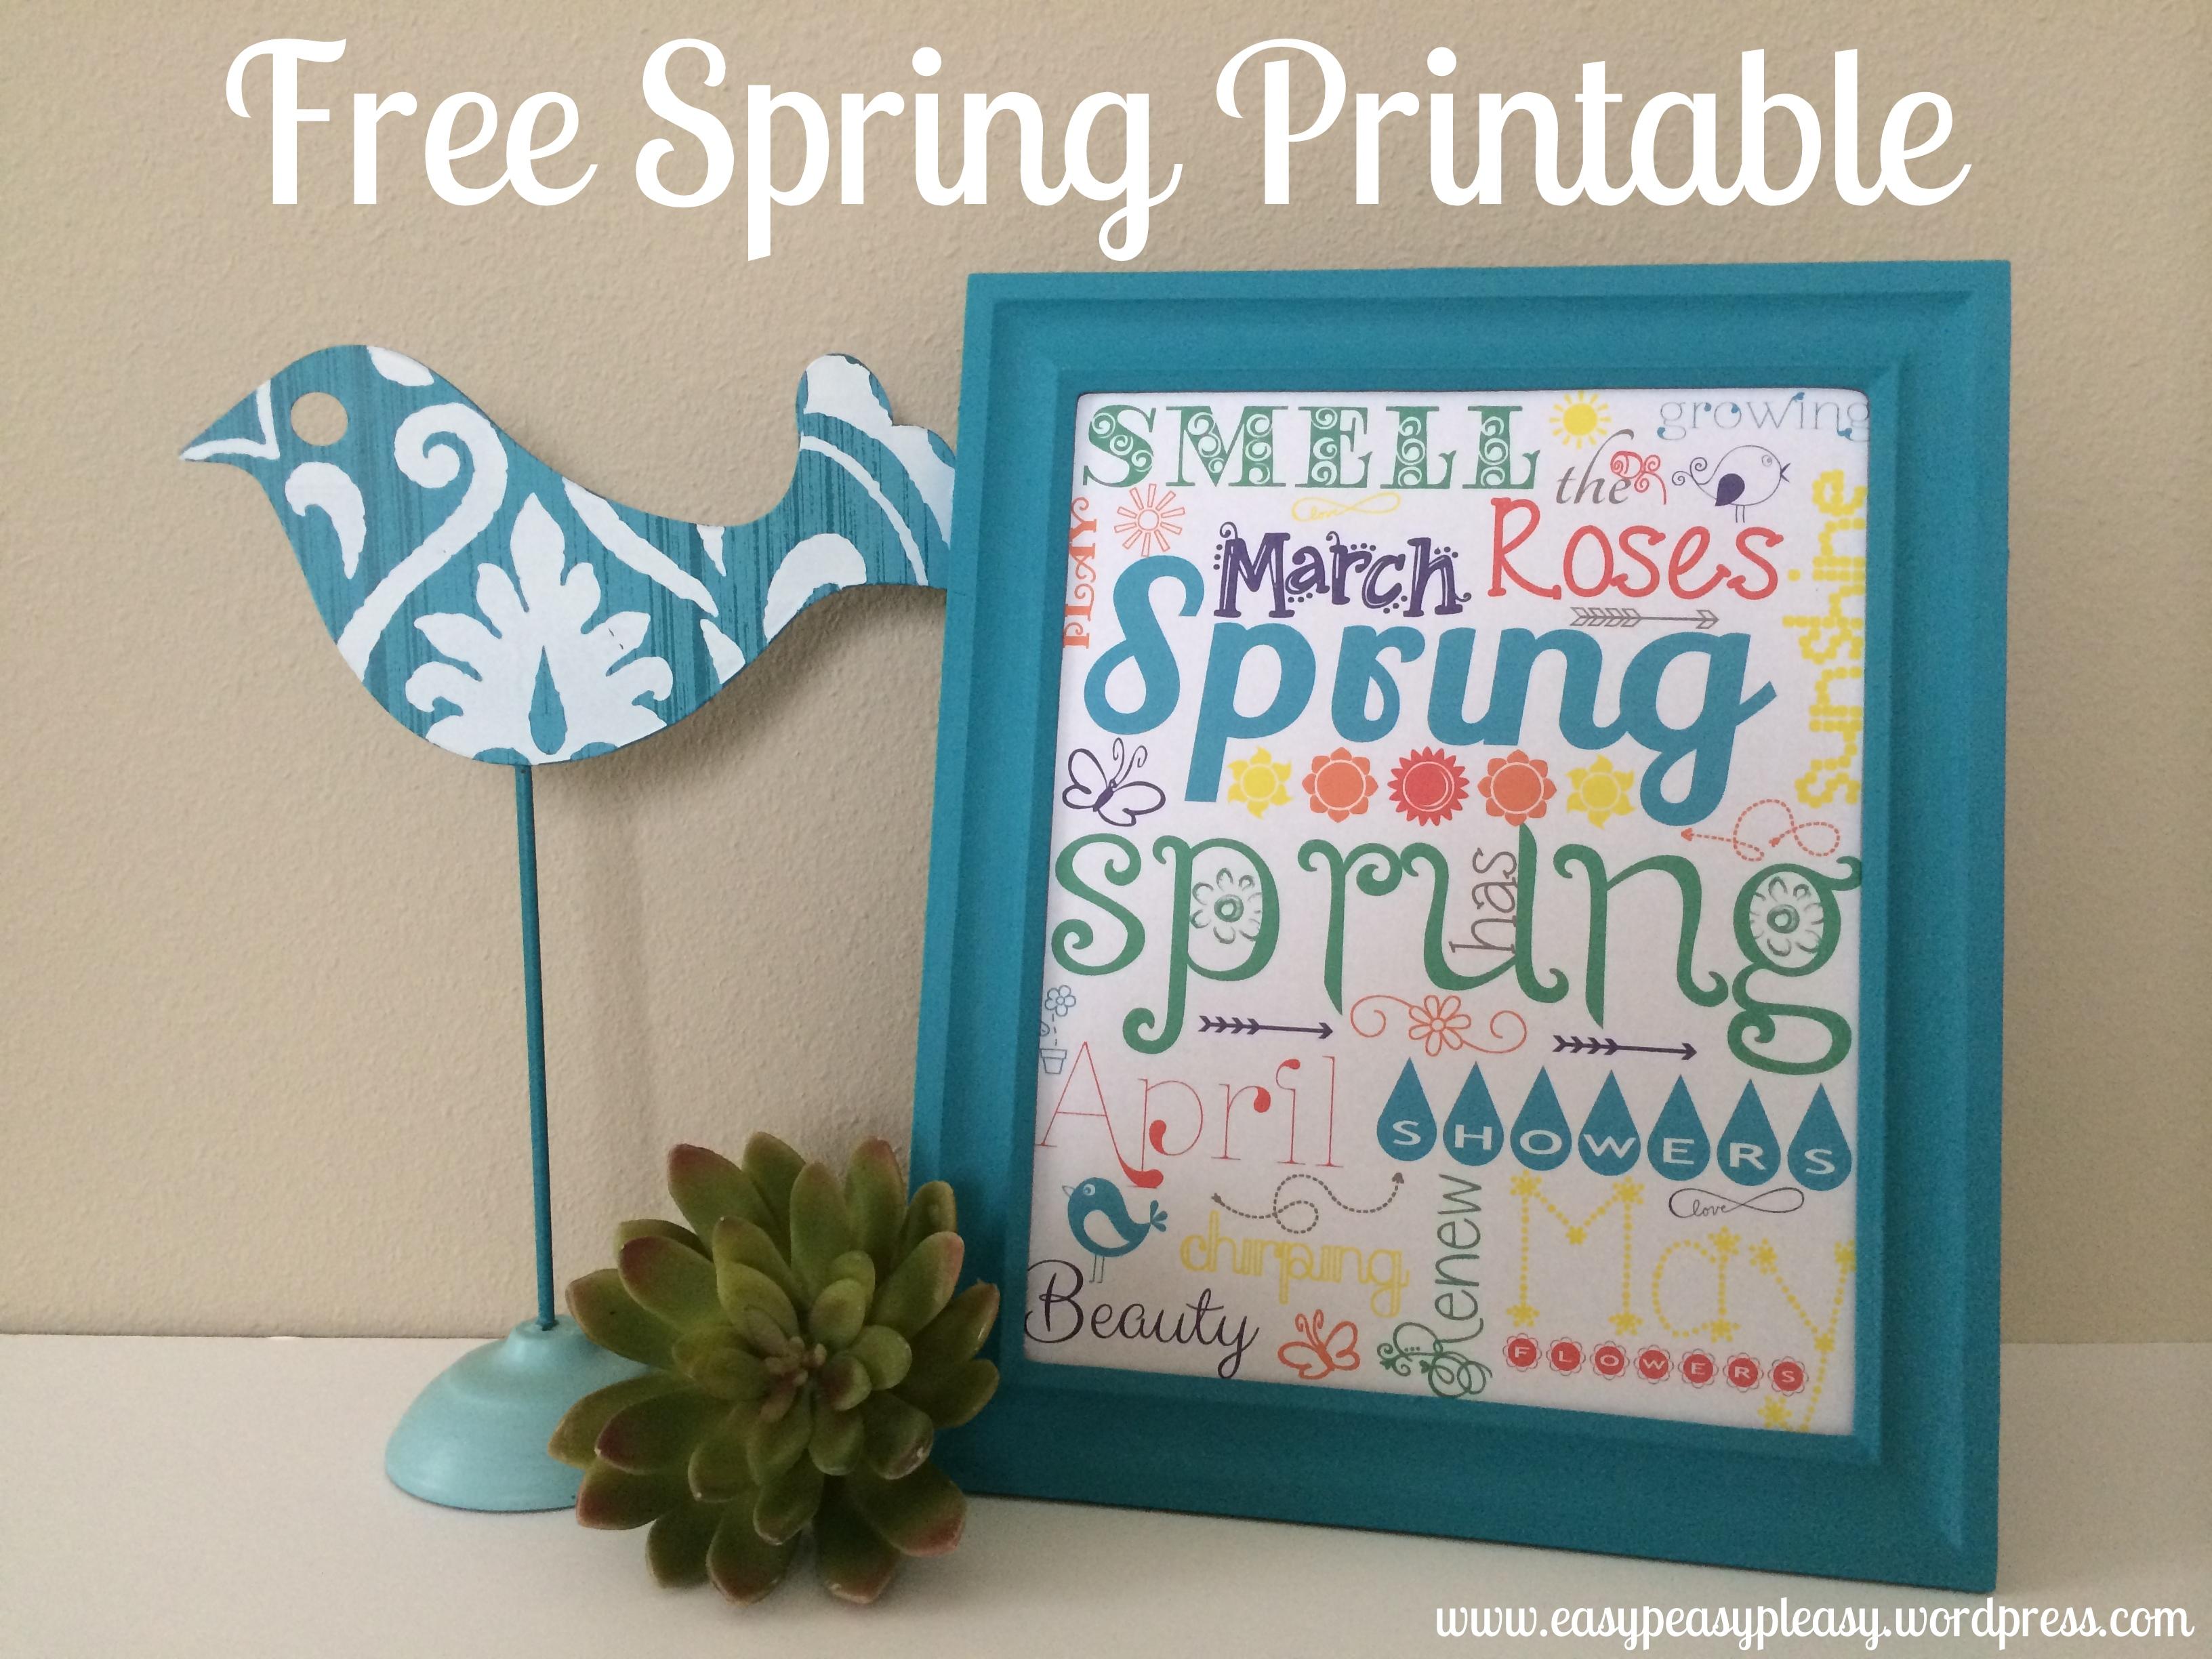 Free Spring Printable using PicMonkey